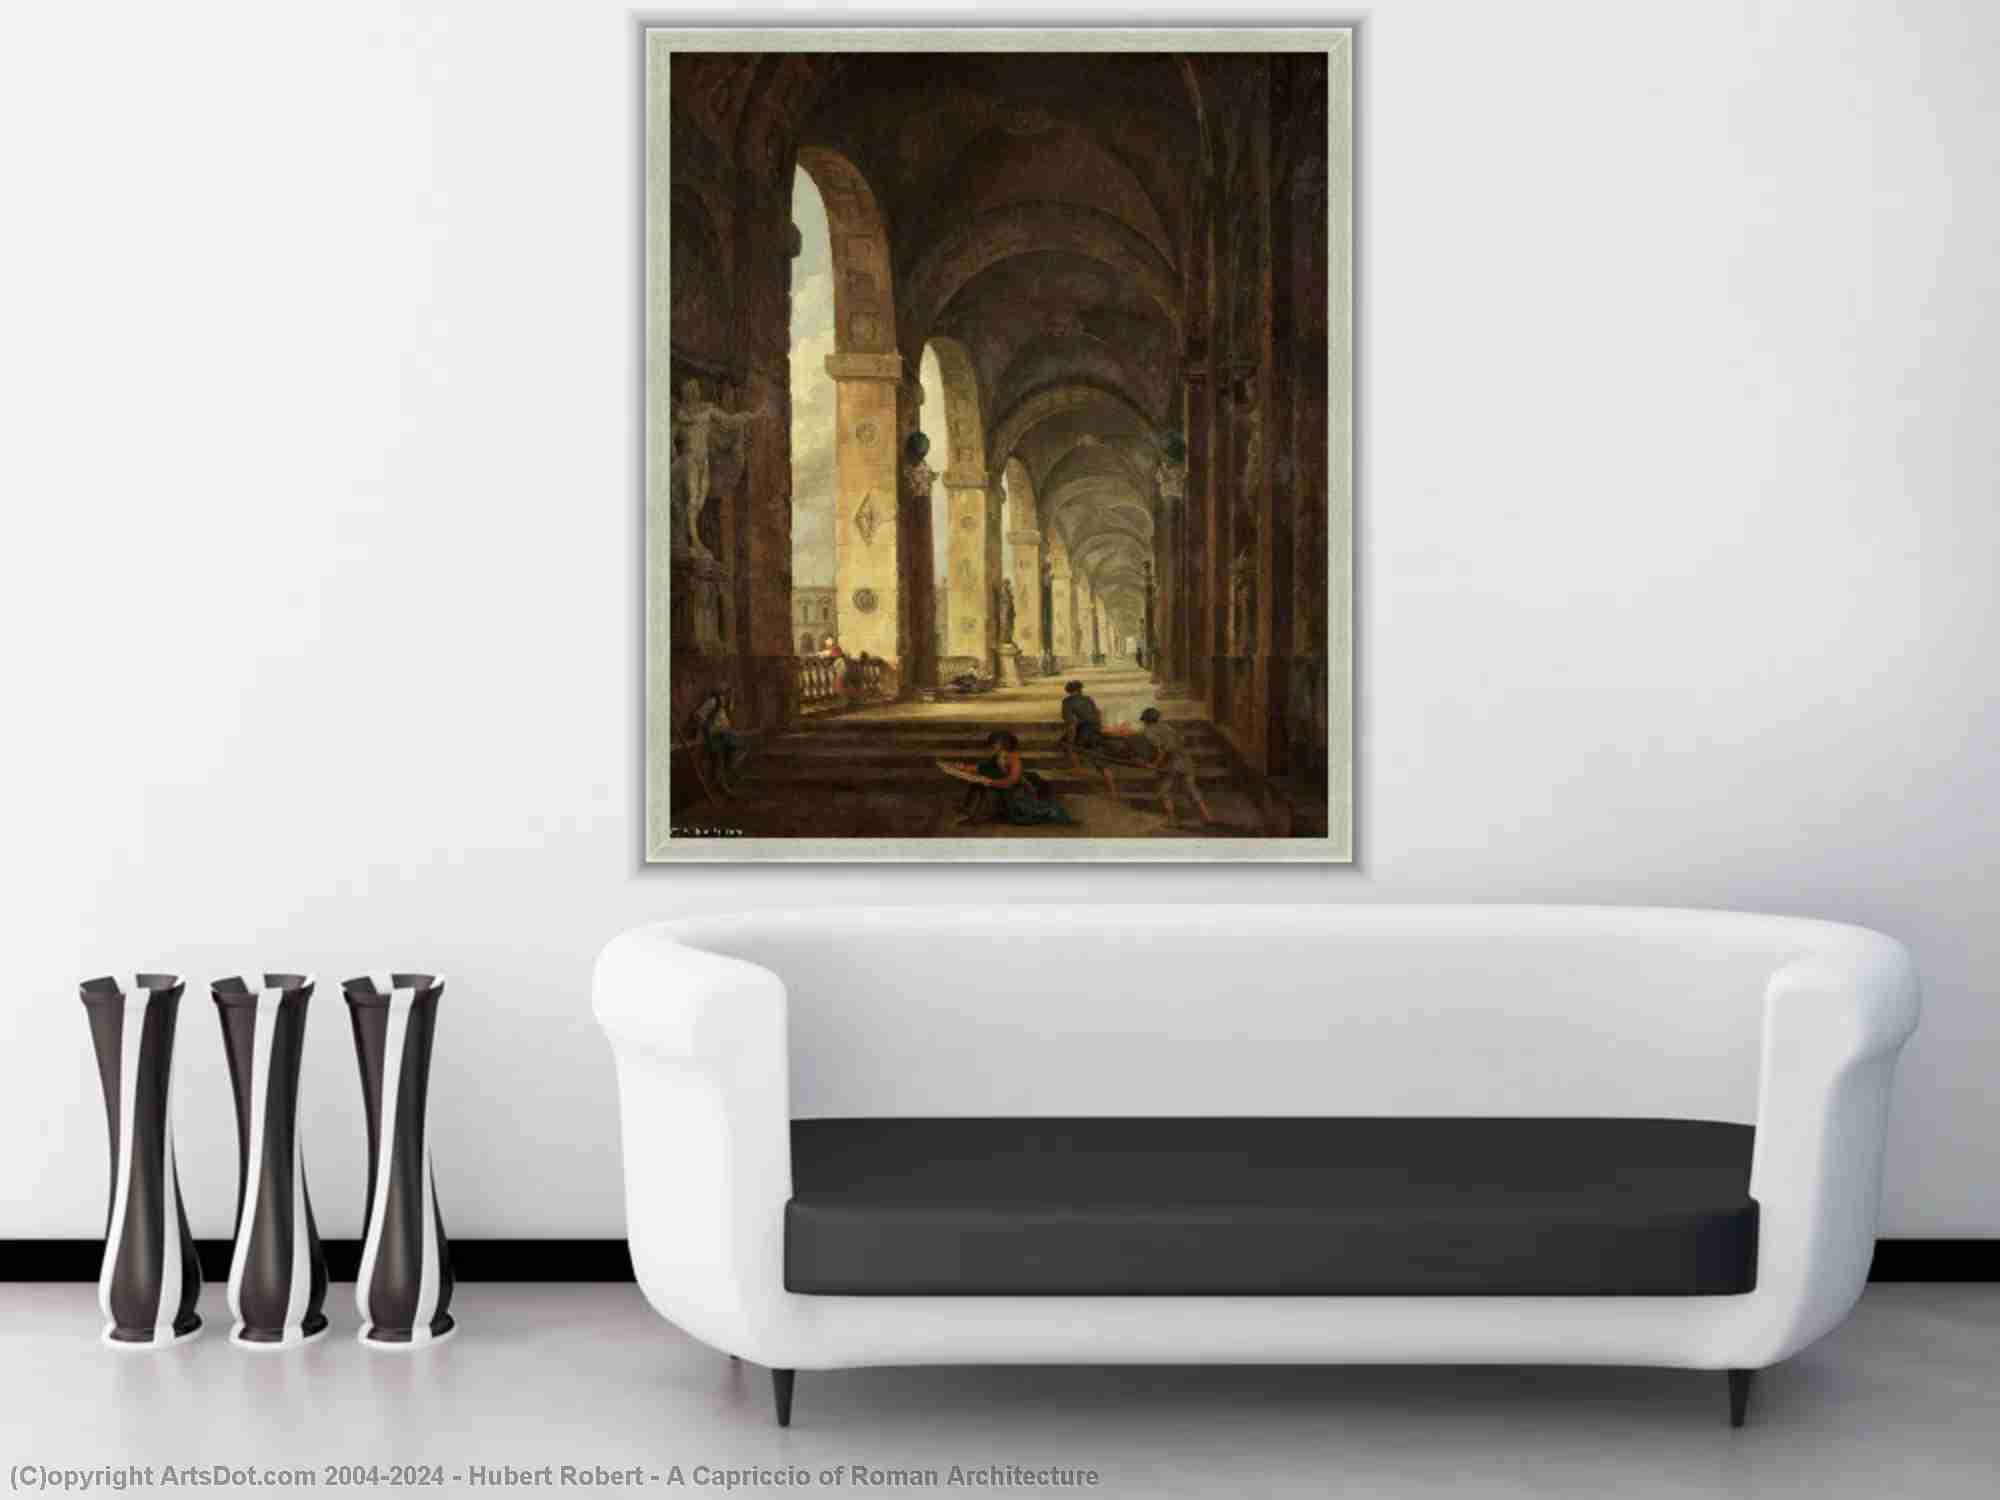 Hubert Robert - A Capriccio of Roman Architecture